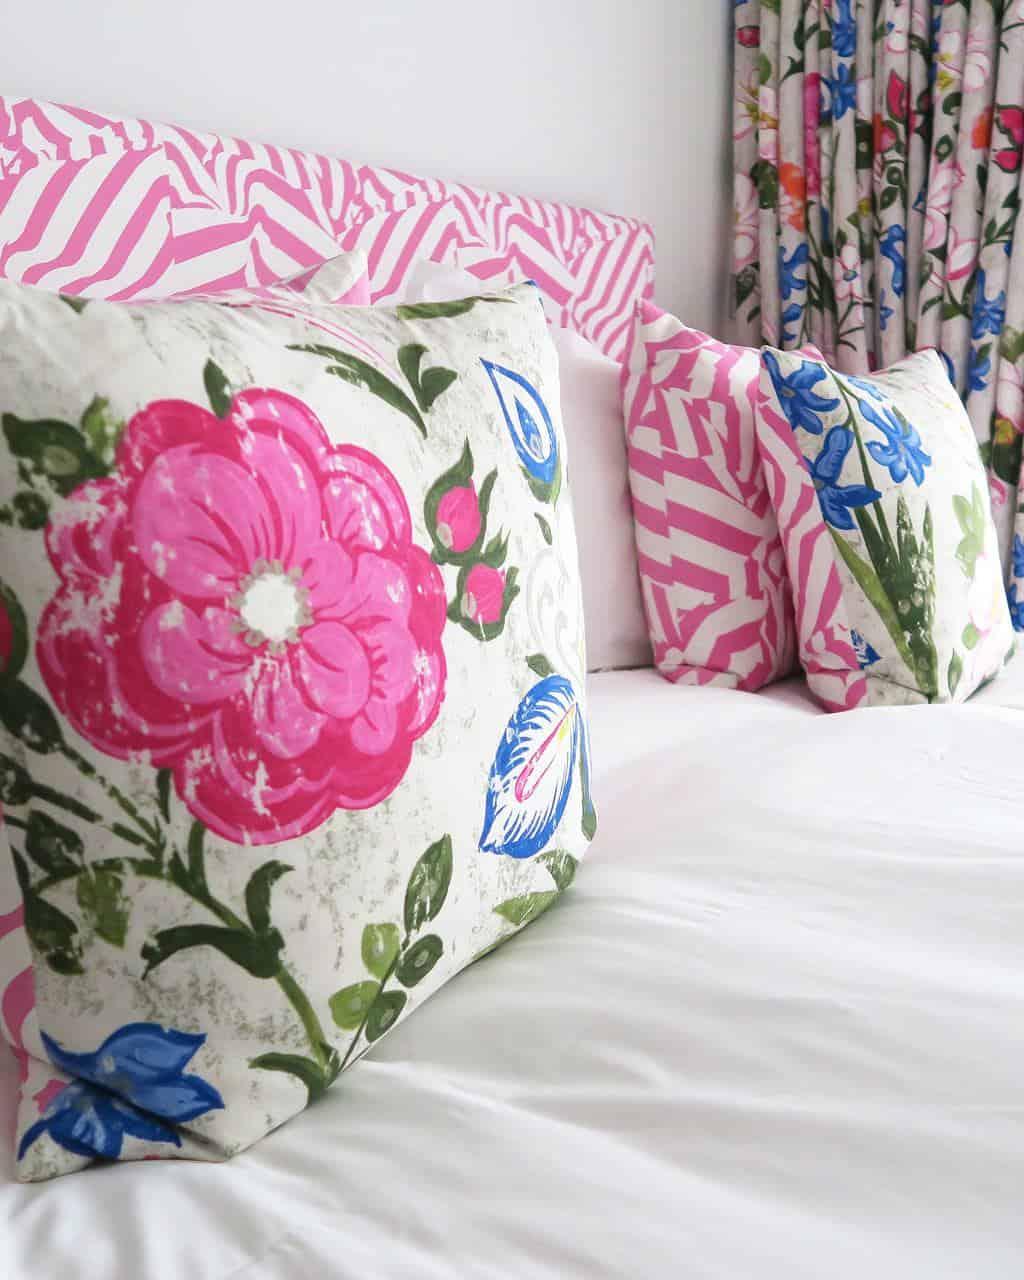 Designer's guild bedding at Dreamcatchers at St Mawes Retreats